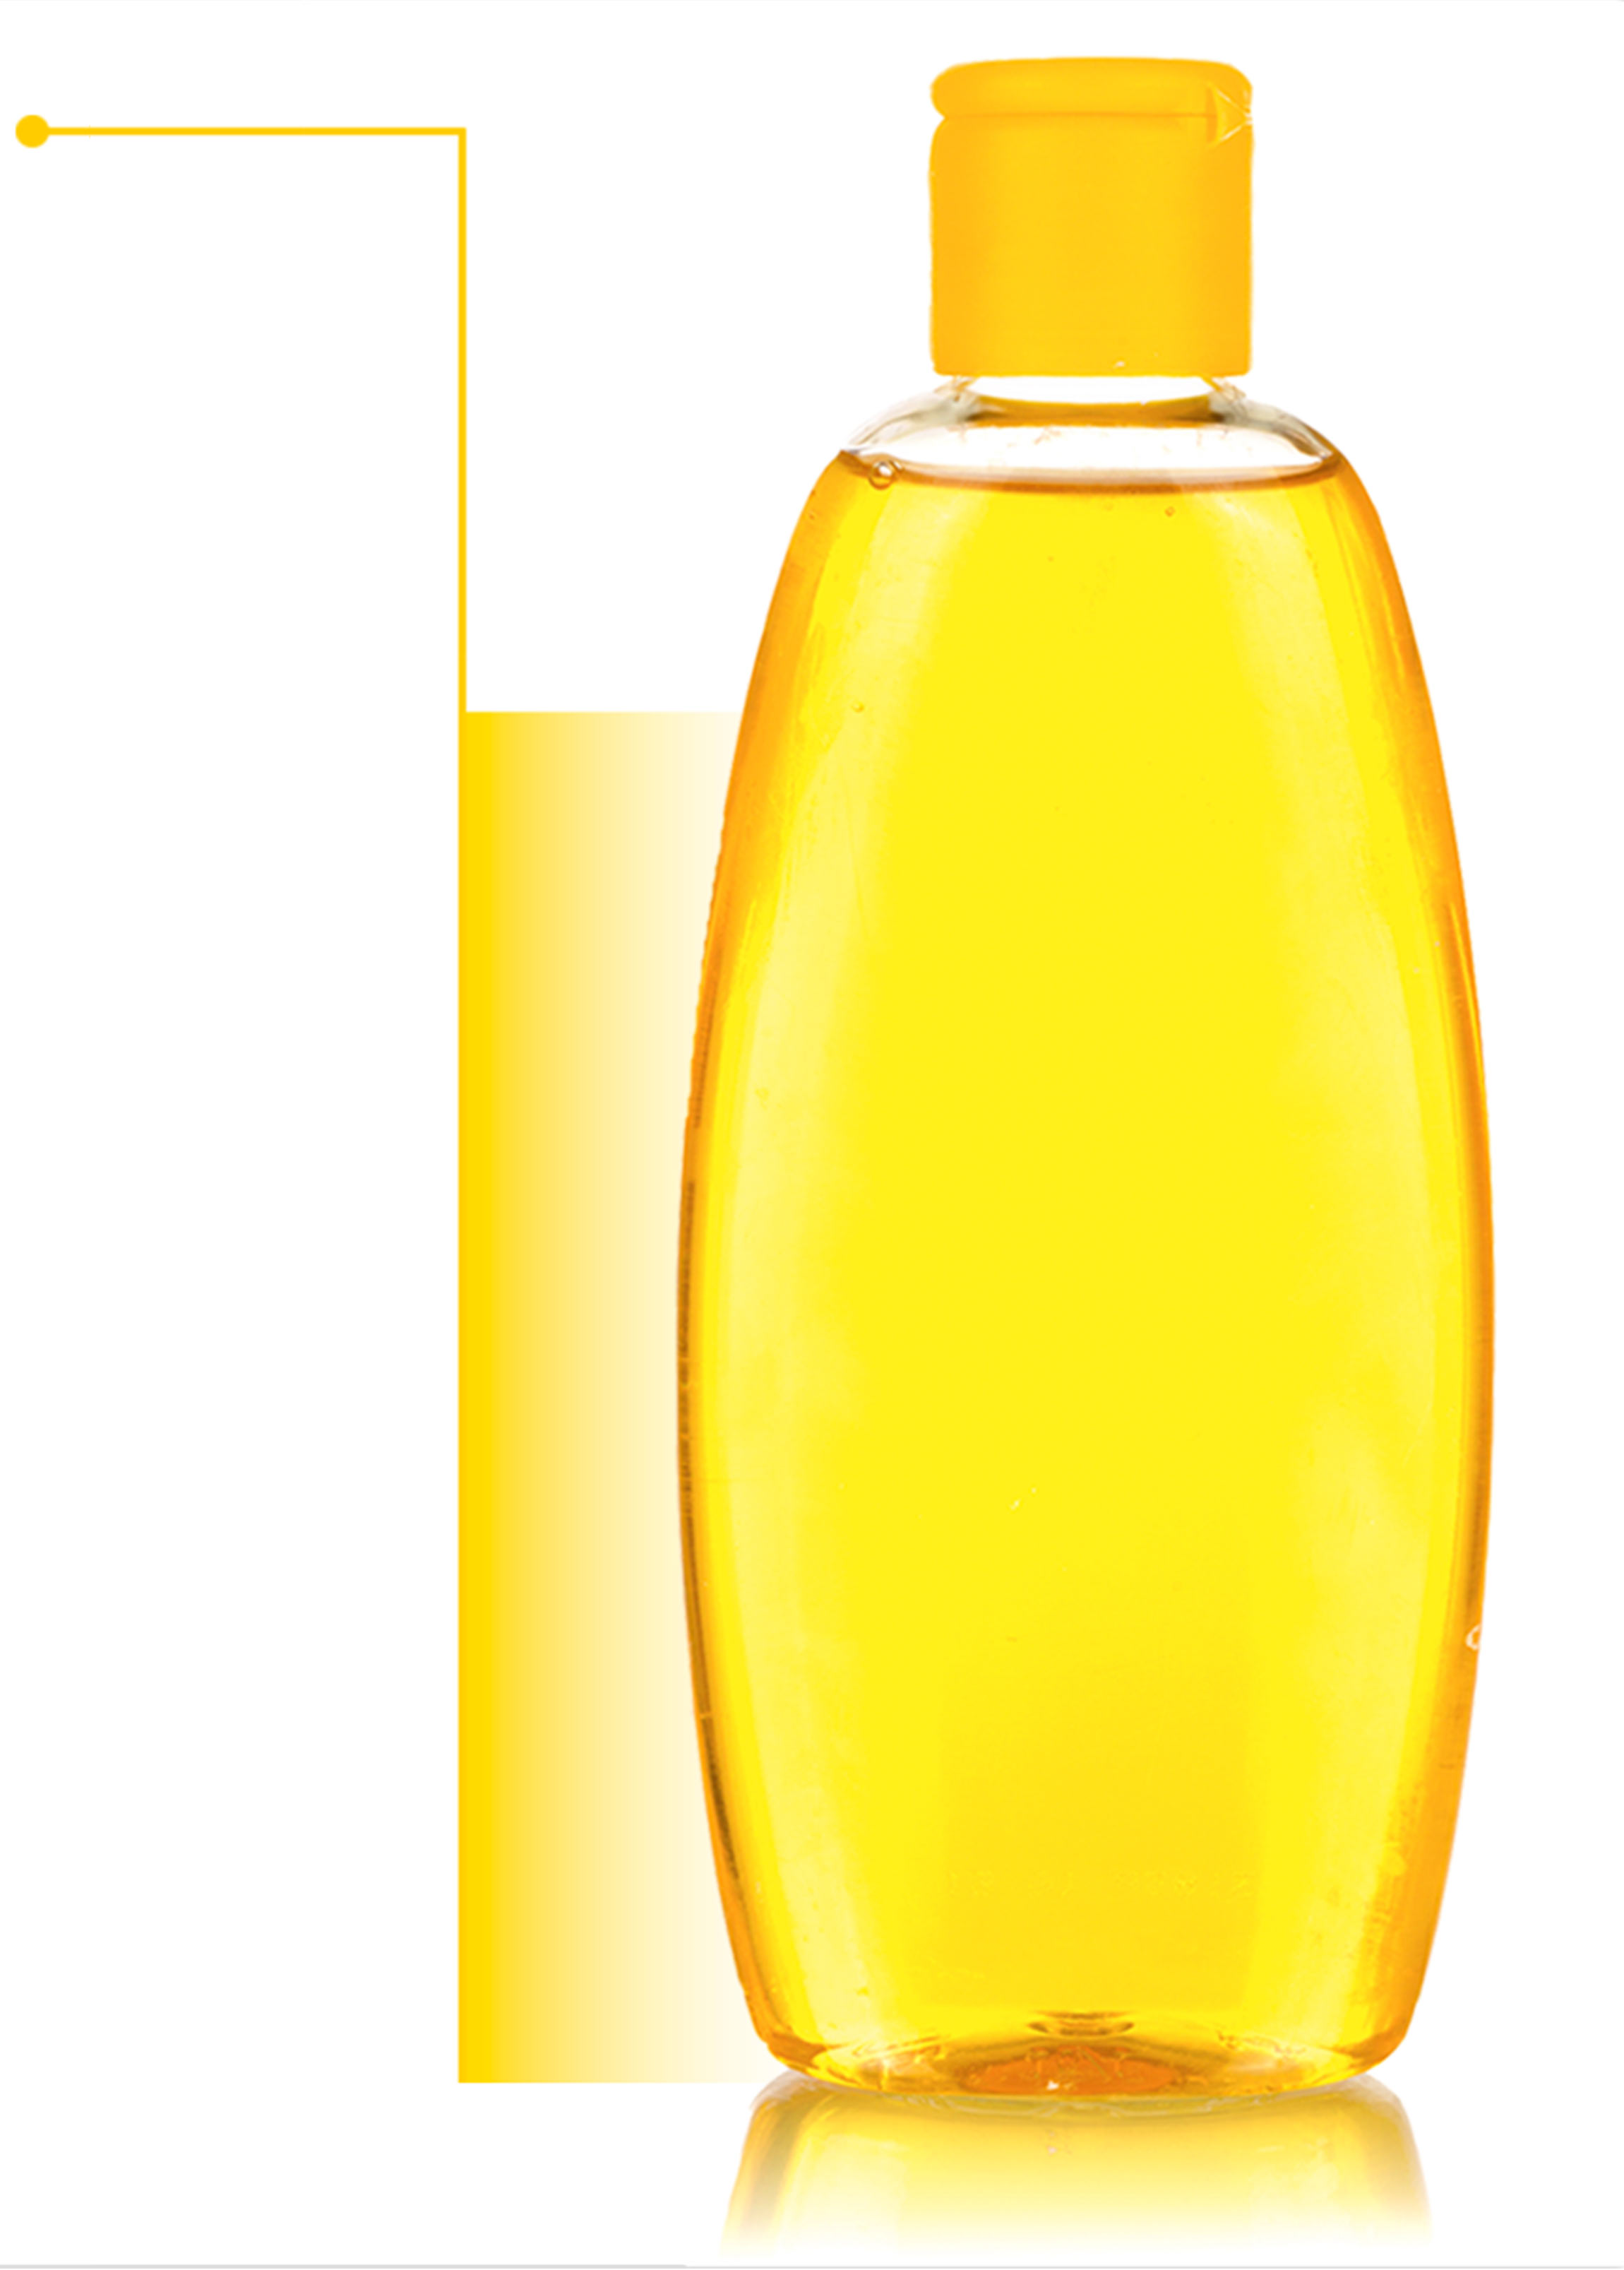 baby product bottle